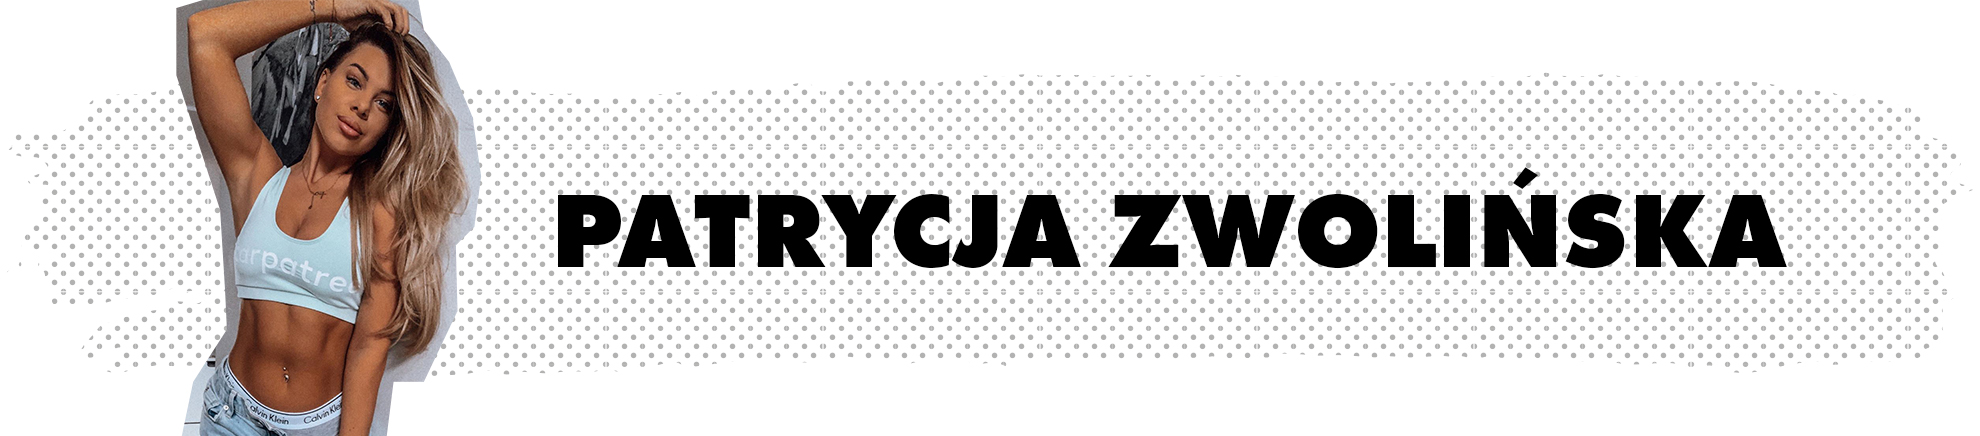 Patrycja Zwolińska - ambasadorka marki Carpatree